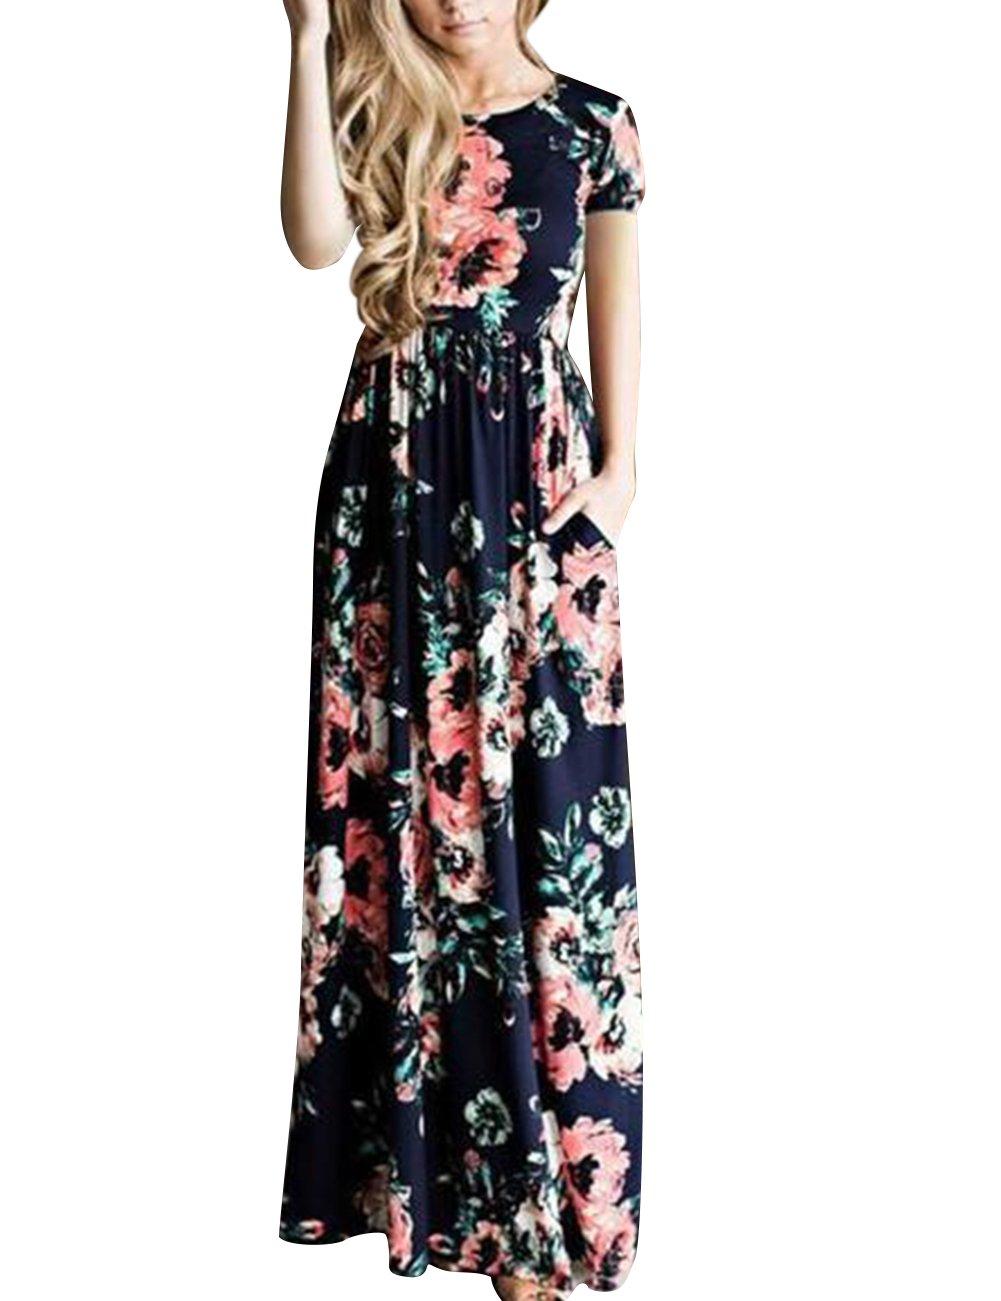 JOYMODE Women's Long Summer Dress Floral Printed Elastic Dresses Black 3XL